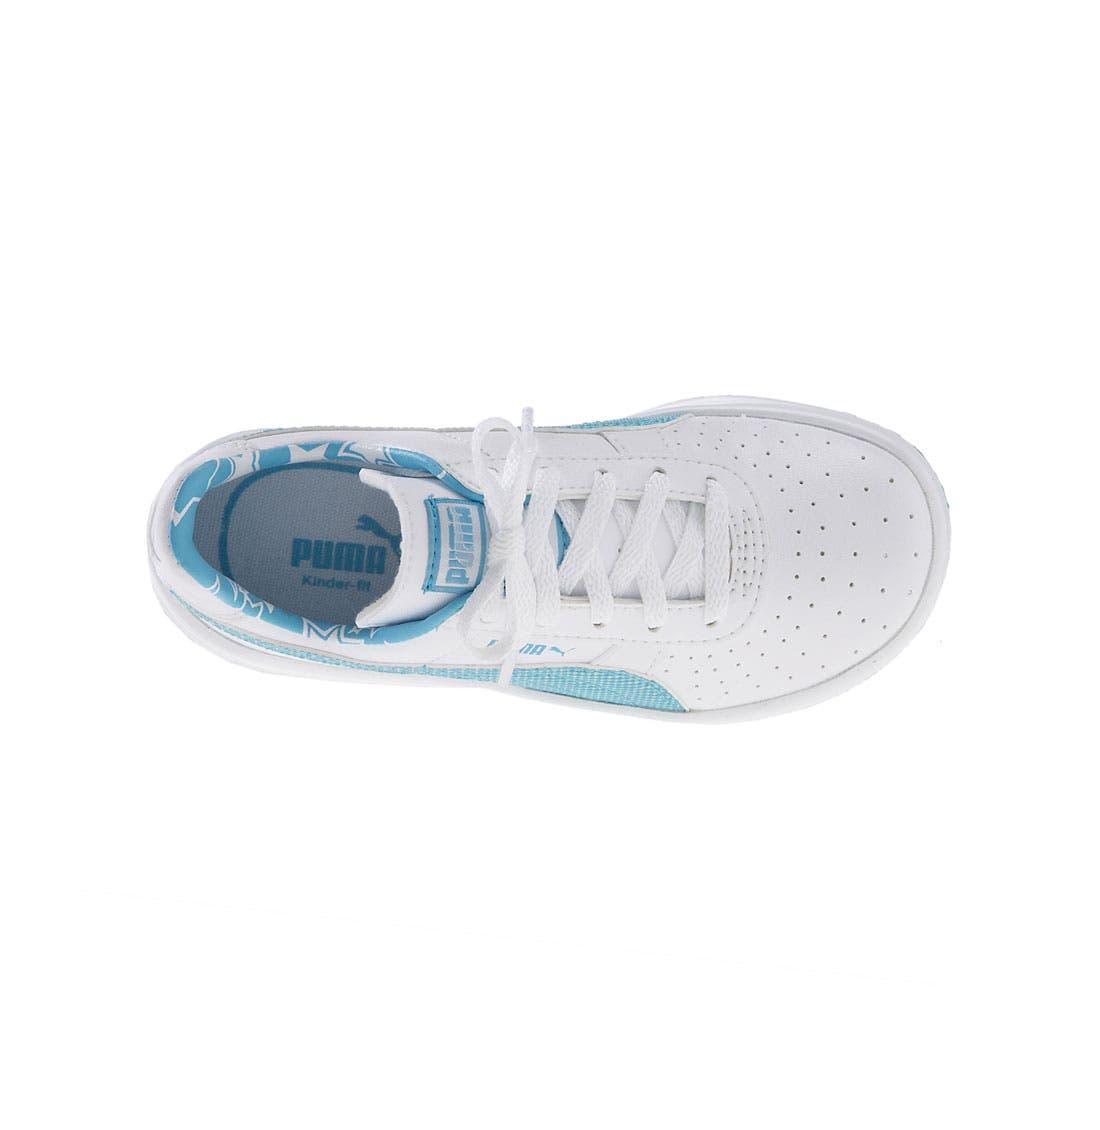 Alternate Image 2  - Puma 'GV Glow' Sneaker (Baby, Walker, Toddler & Little Kid) (Nordstrom Exclusive)